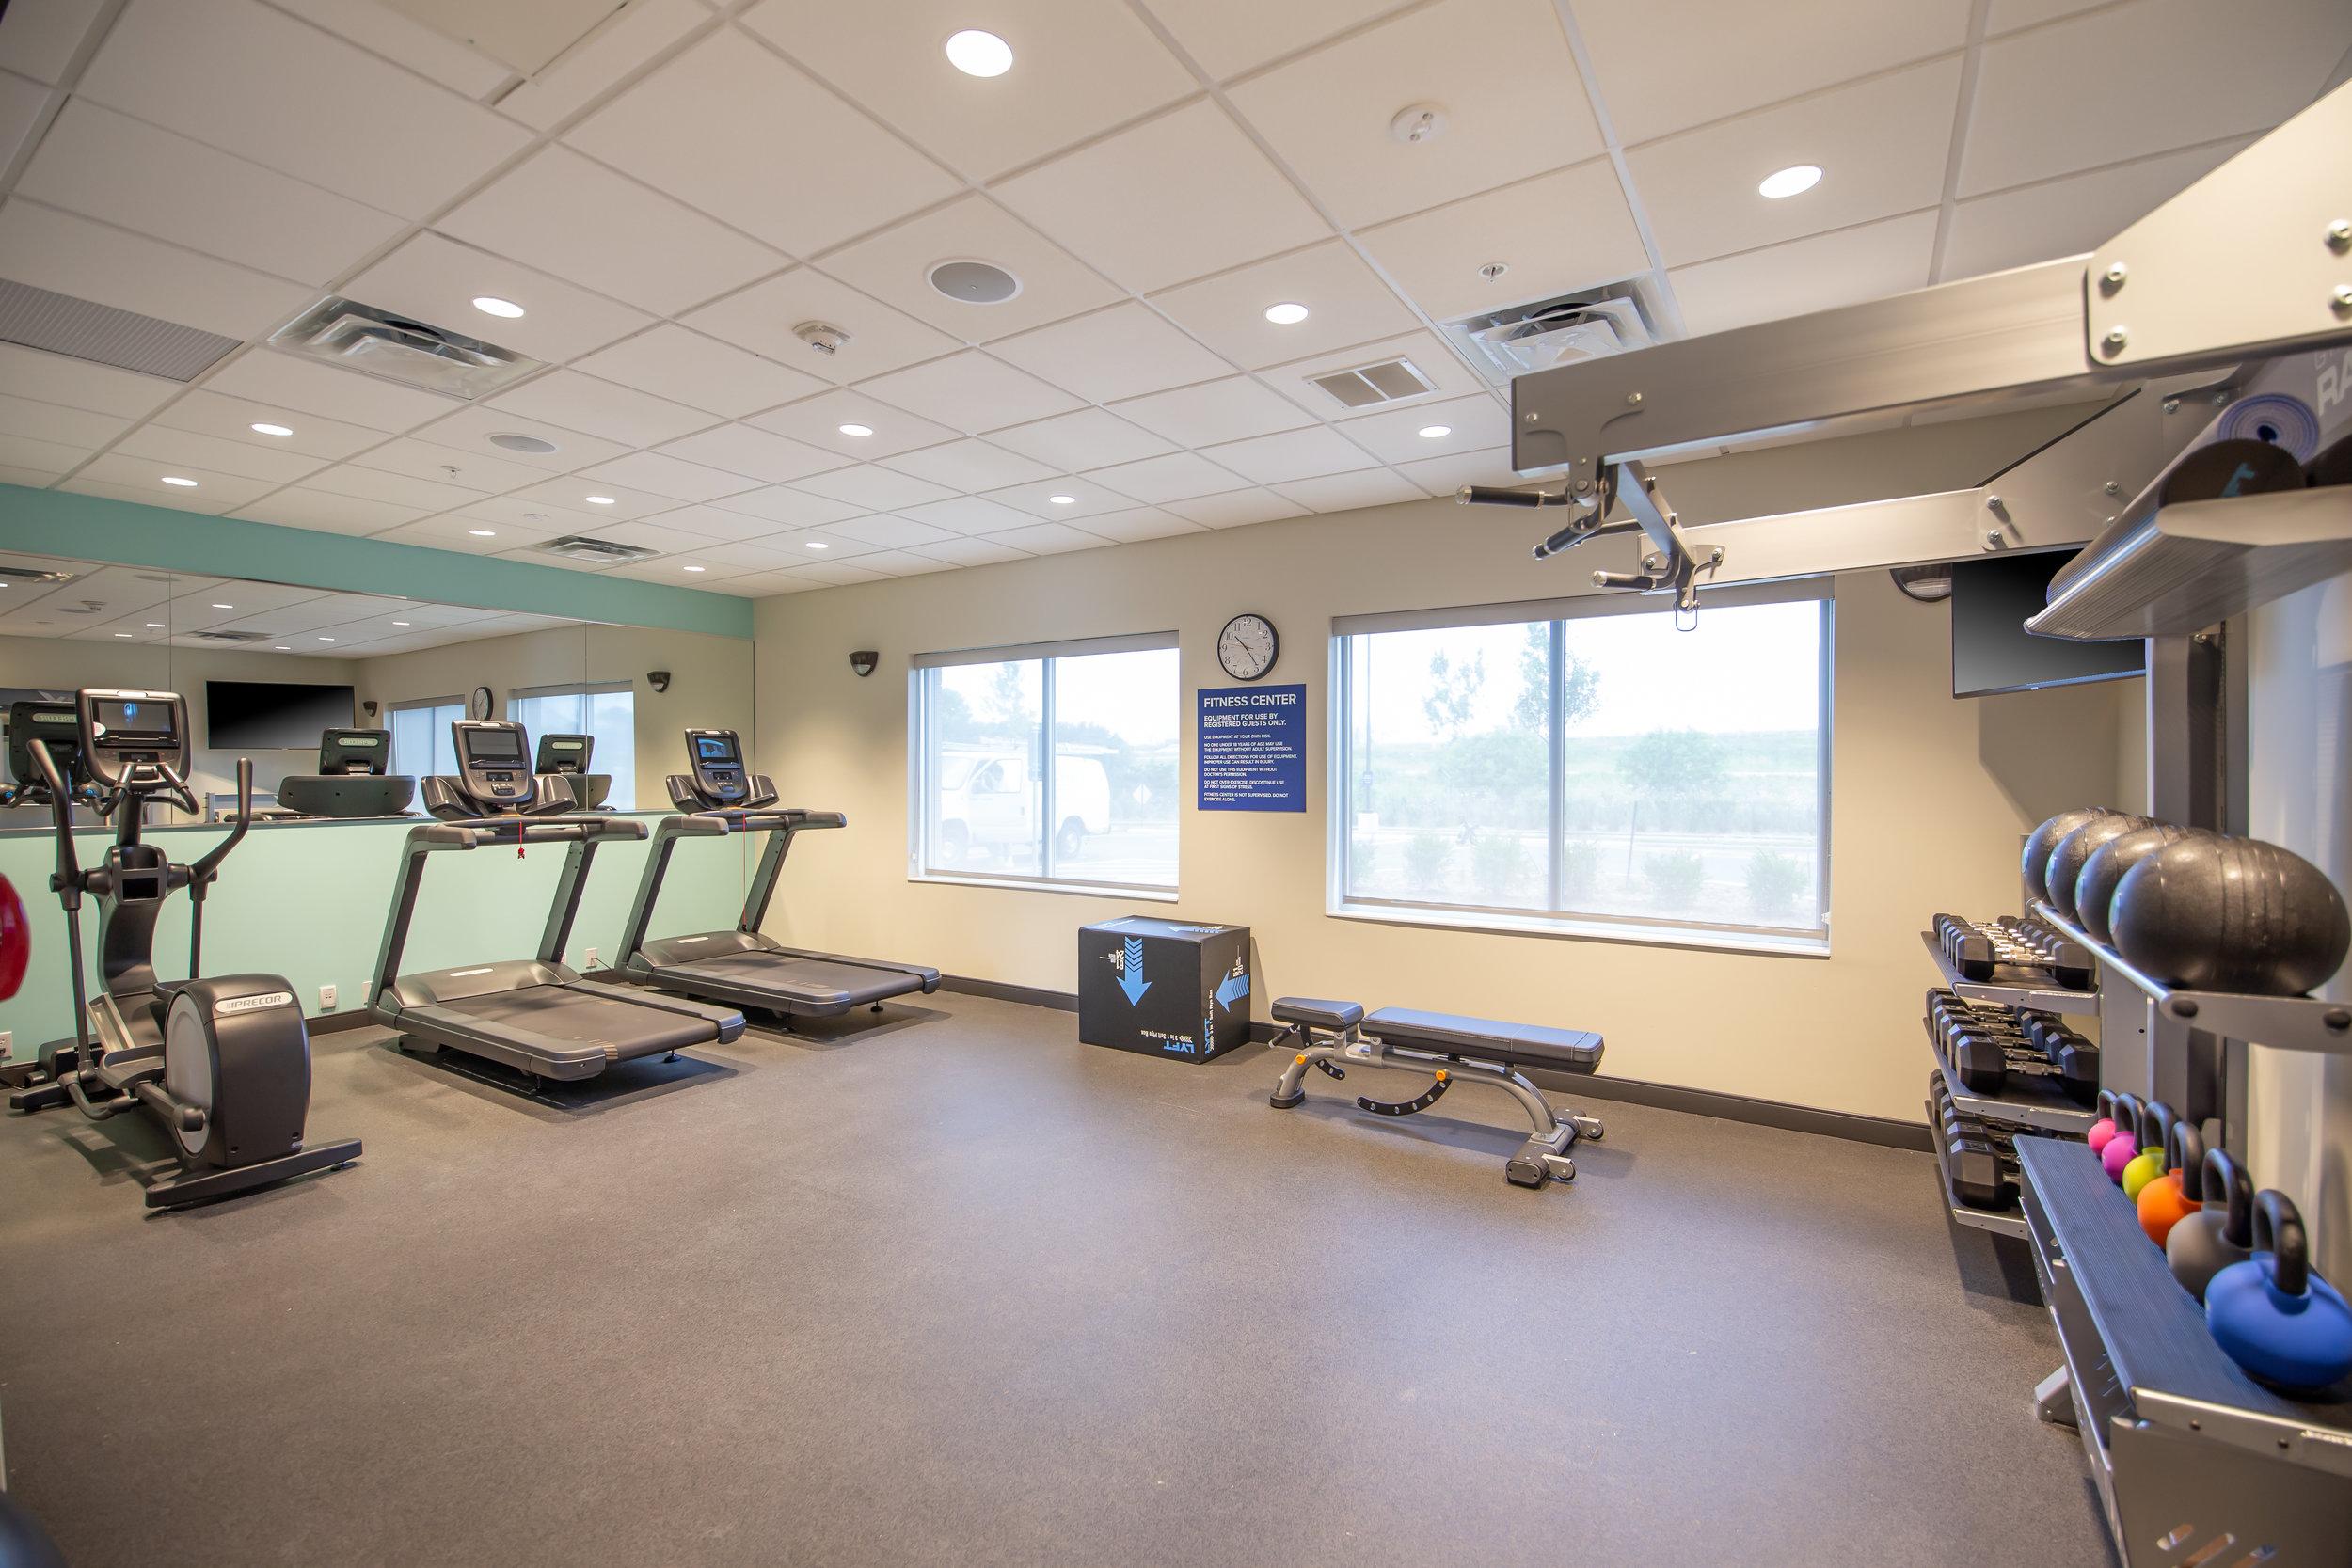 Fitness room in Tru by Hilton in Brookfield, WI